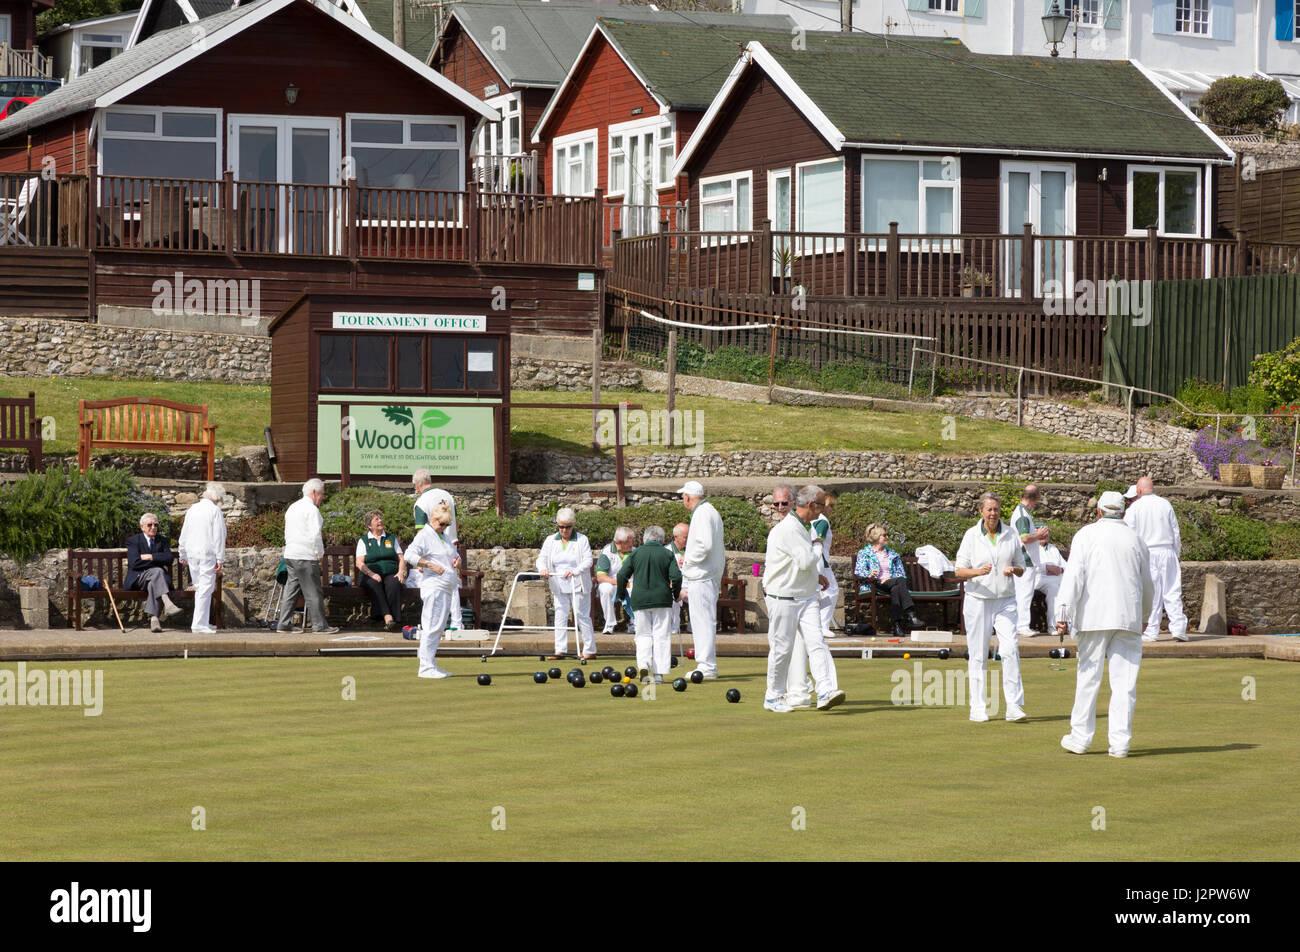 Lawn bowling - people playing a lawn bowls match, Lyme Regis Lawn Bowls Club, Dorset UJK - Stock Image